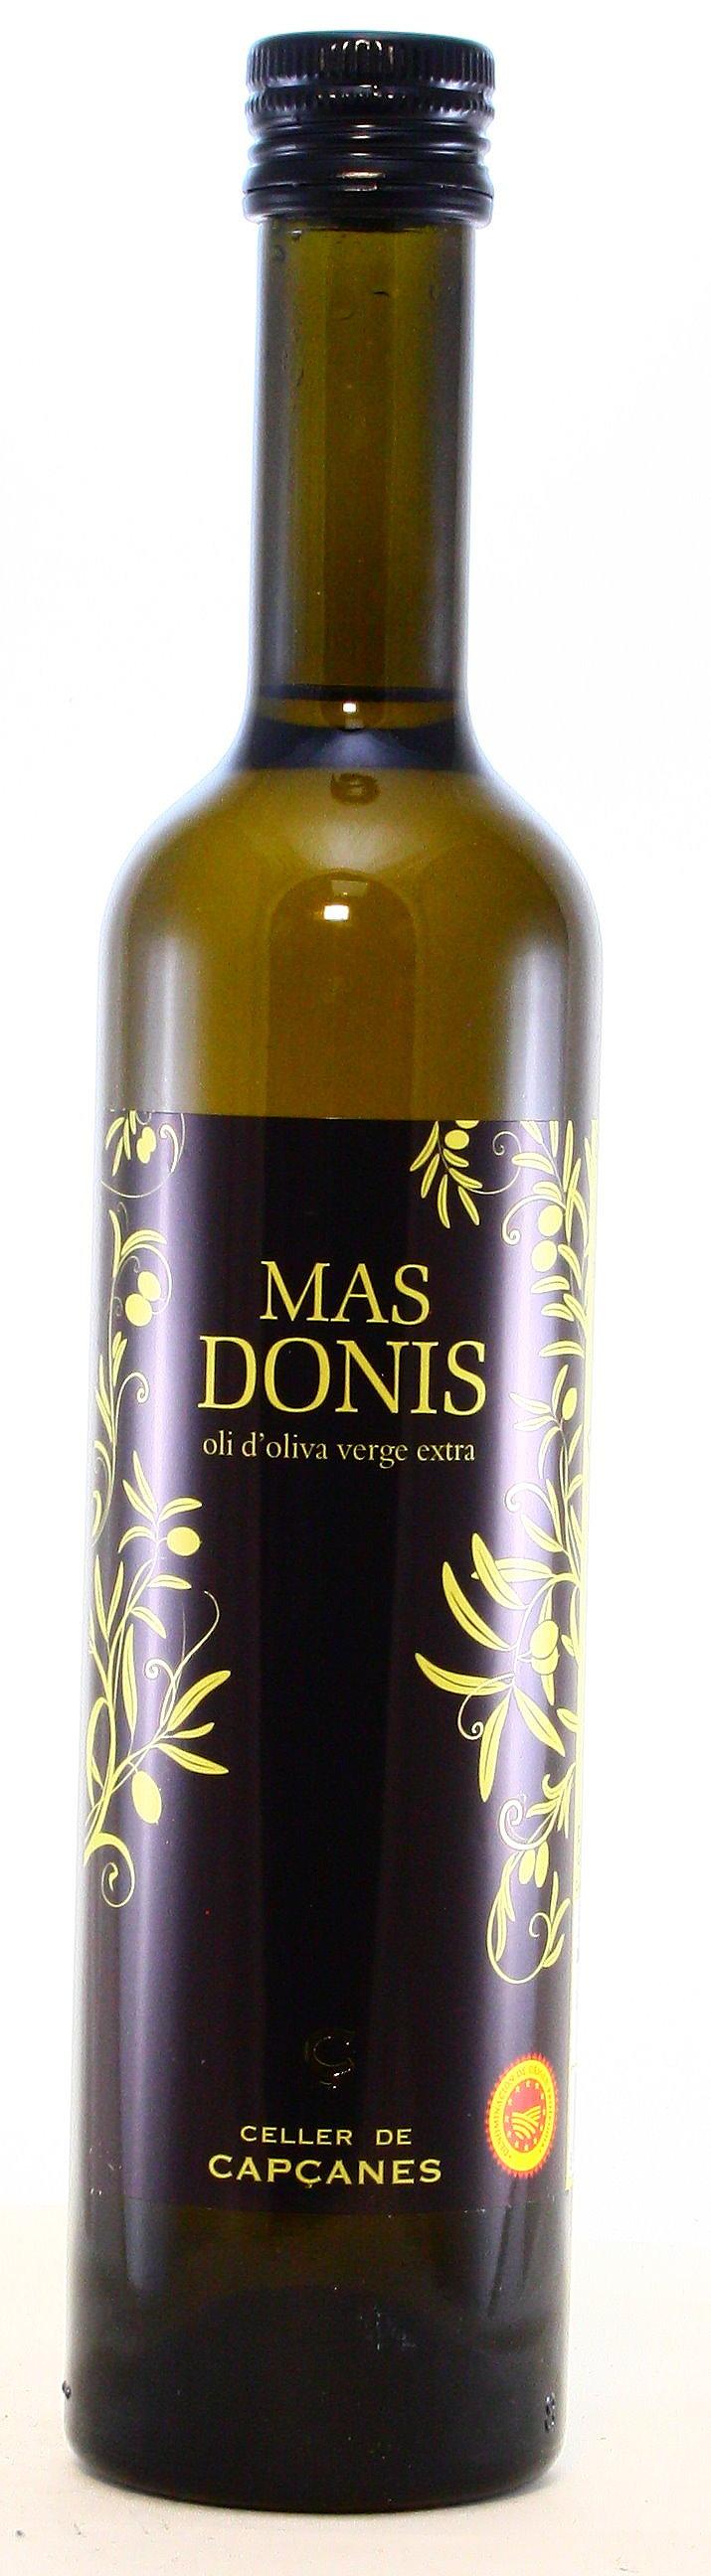 Mas Donis Oli d'Oliva - Spanisches Olivenöl